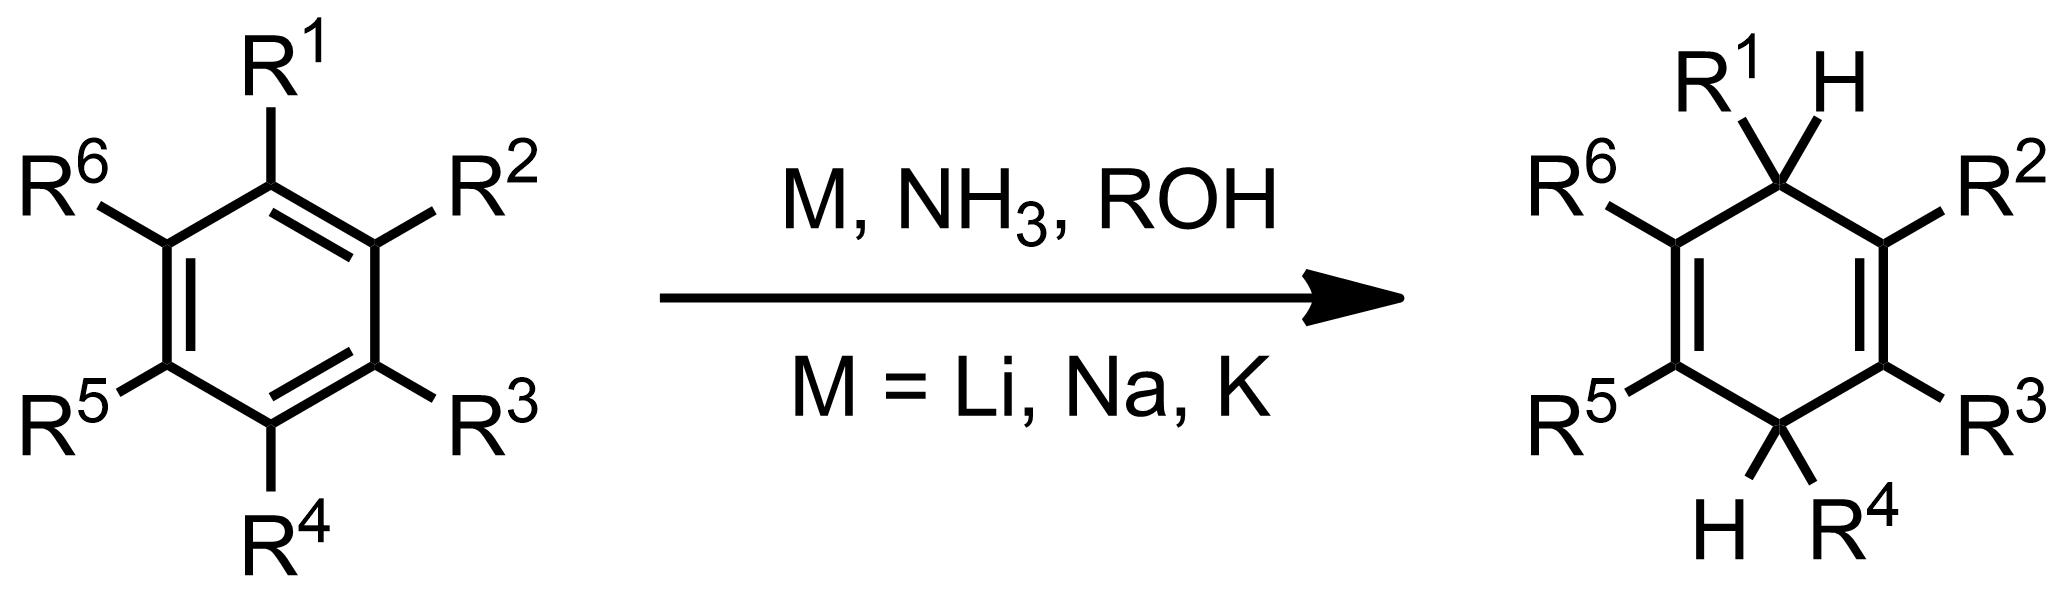 Schematic representation of the Birch Reduction.